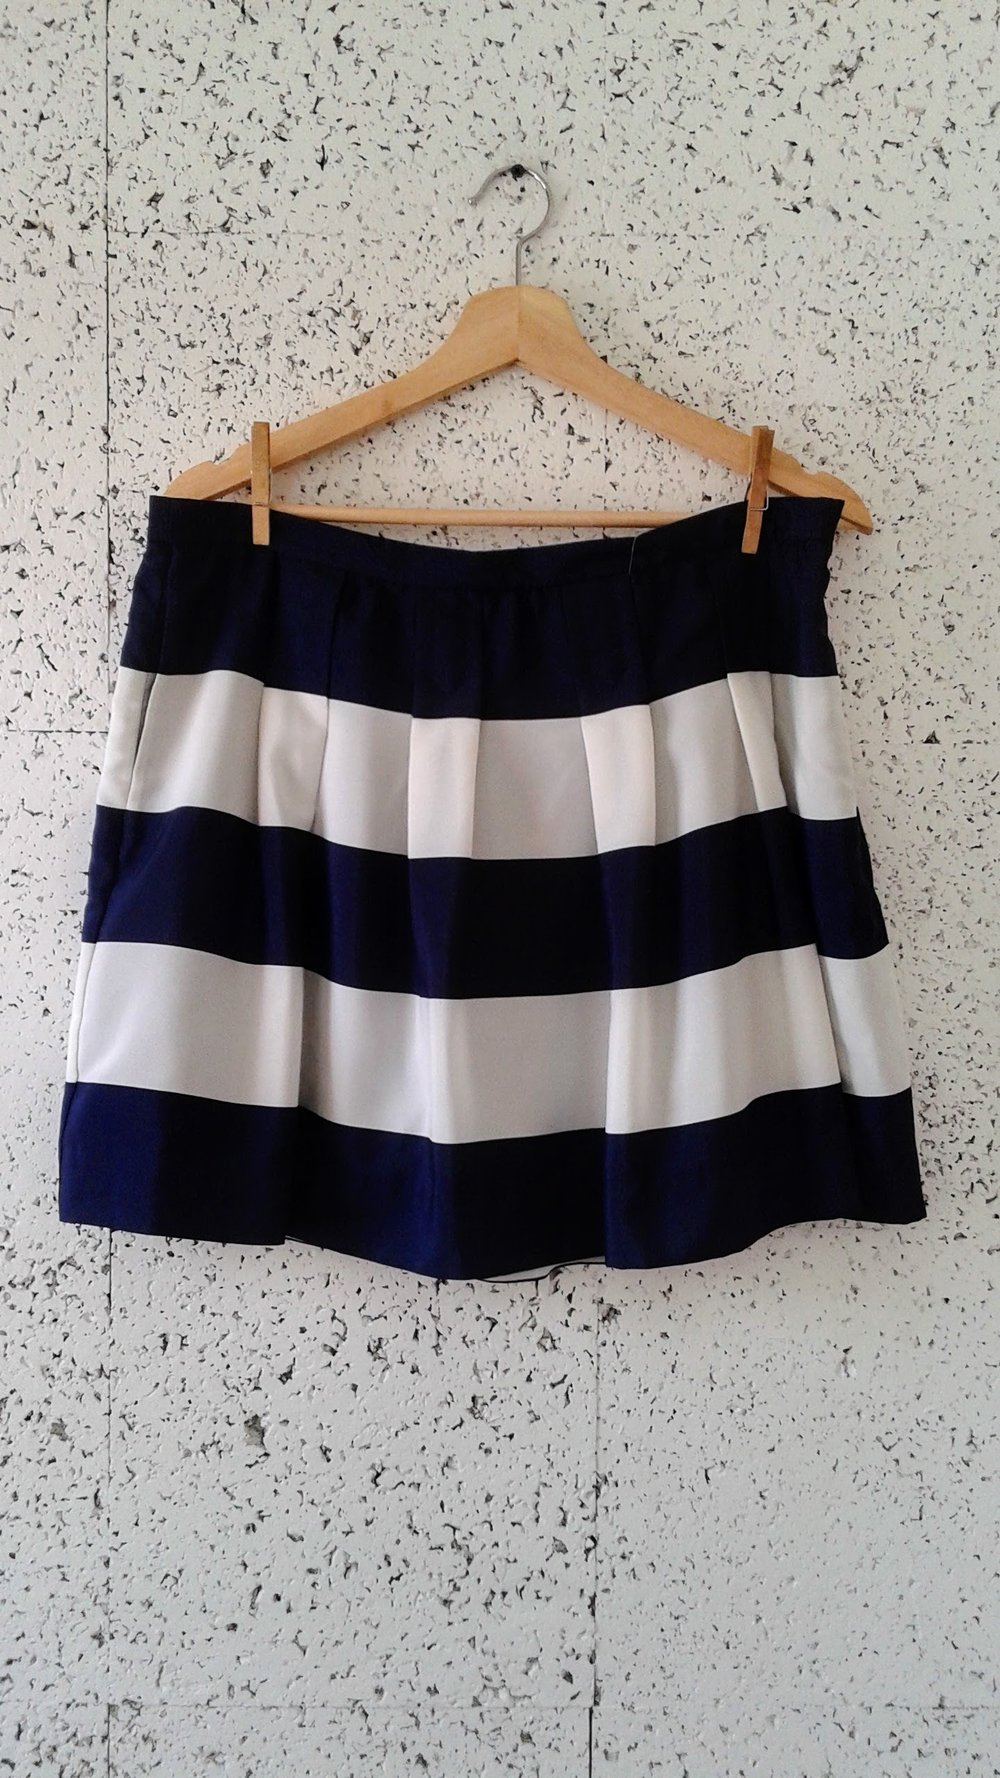 J Crew skirt; Size 12, $26